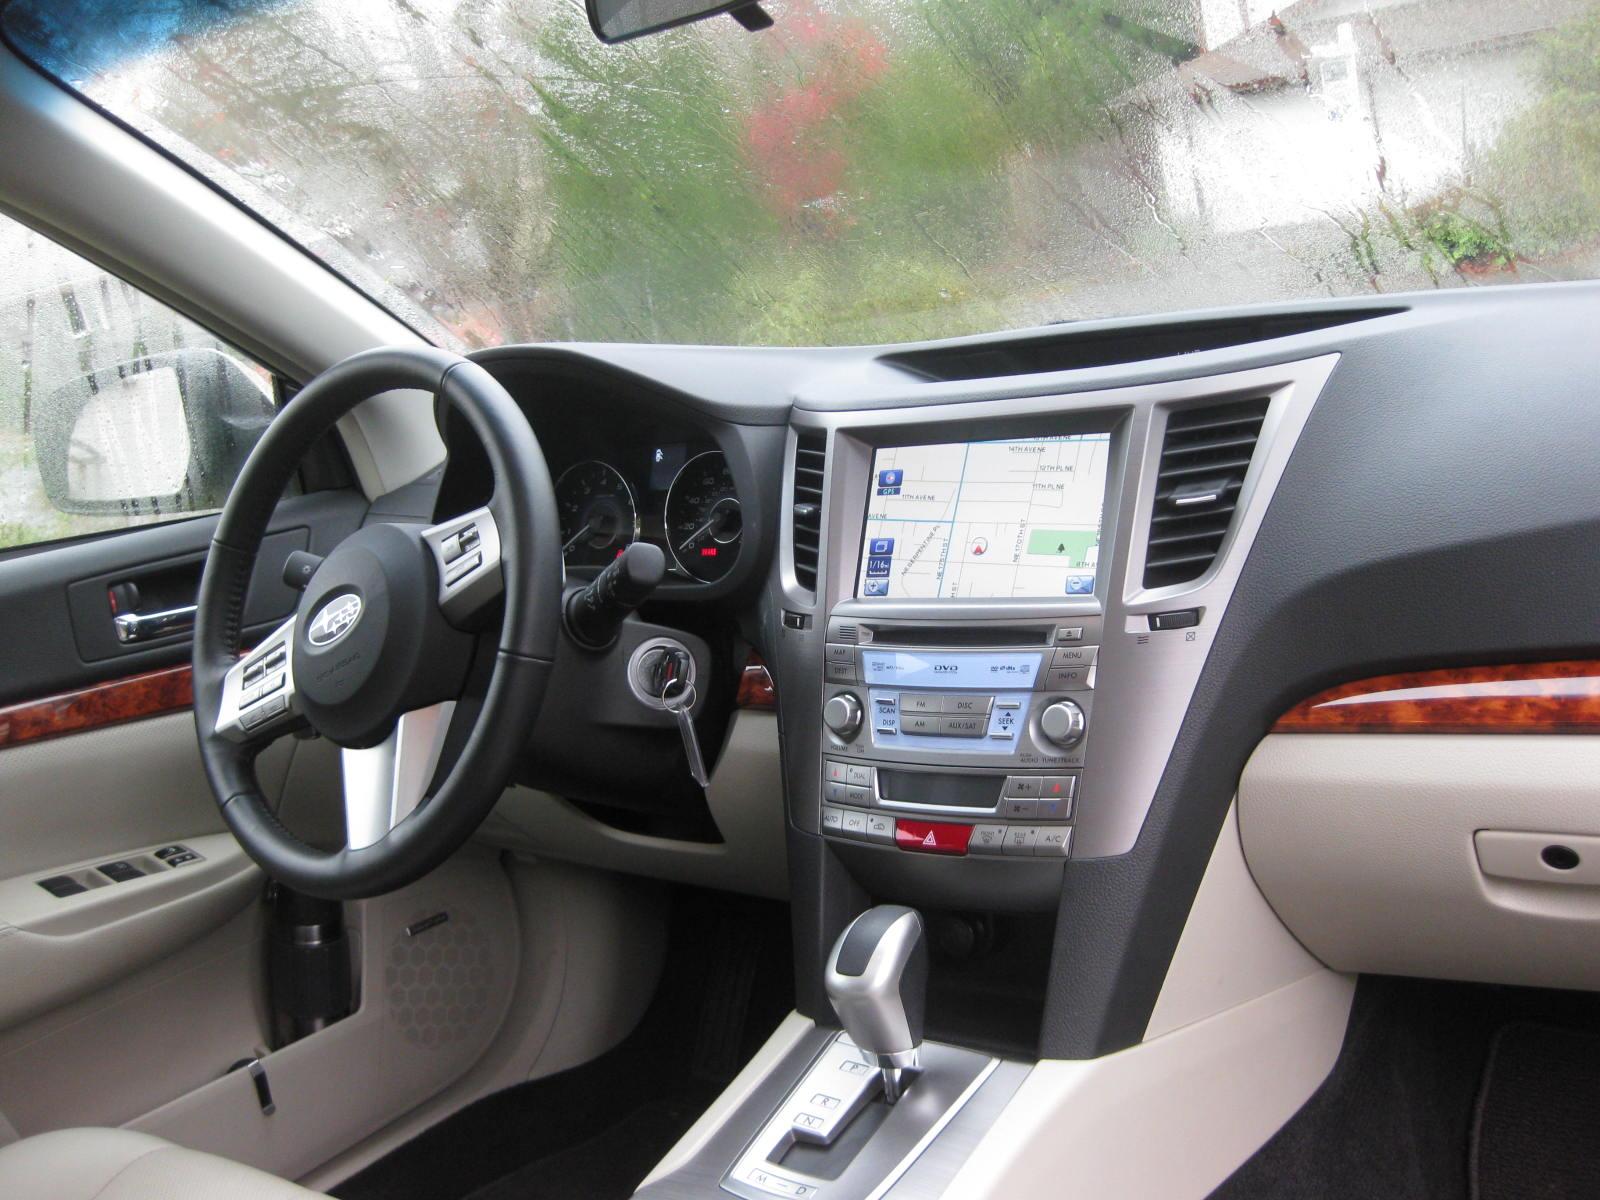 Subaru Auto Dimming Mirrorsubaru Homelink Mirror Wiring Diagram 2010 Outback 3 6r Limited Review Autosavant